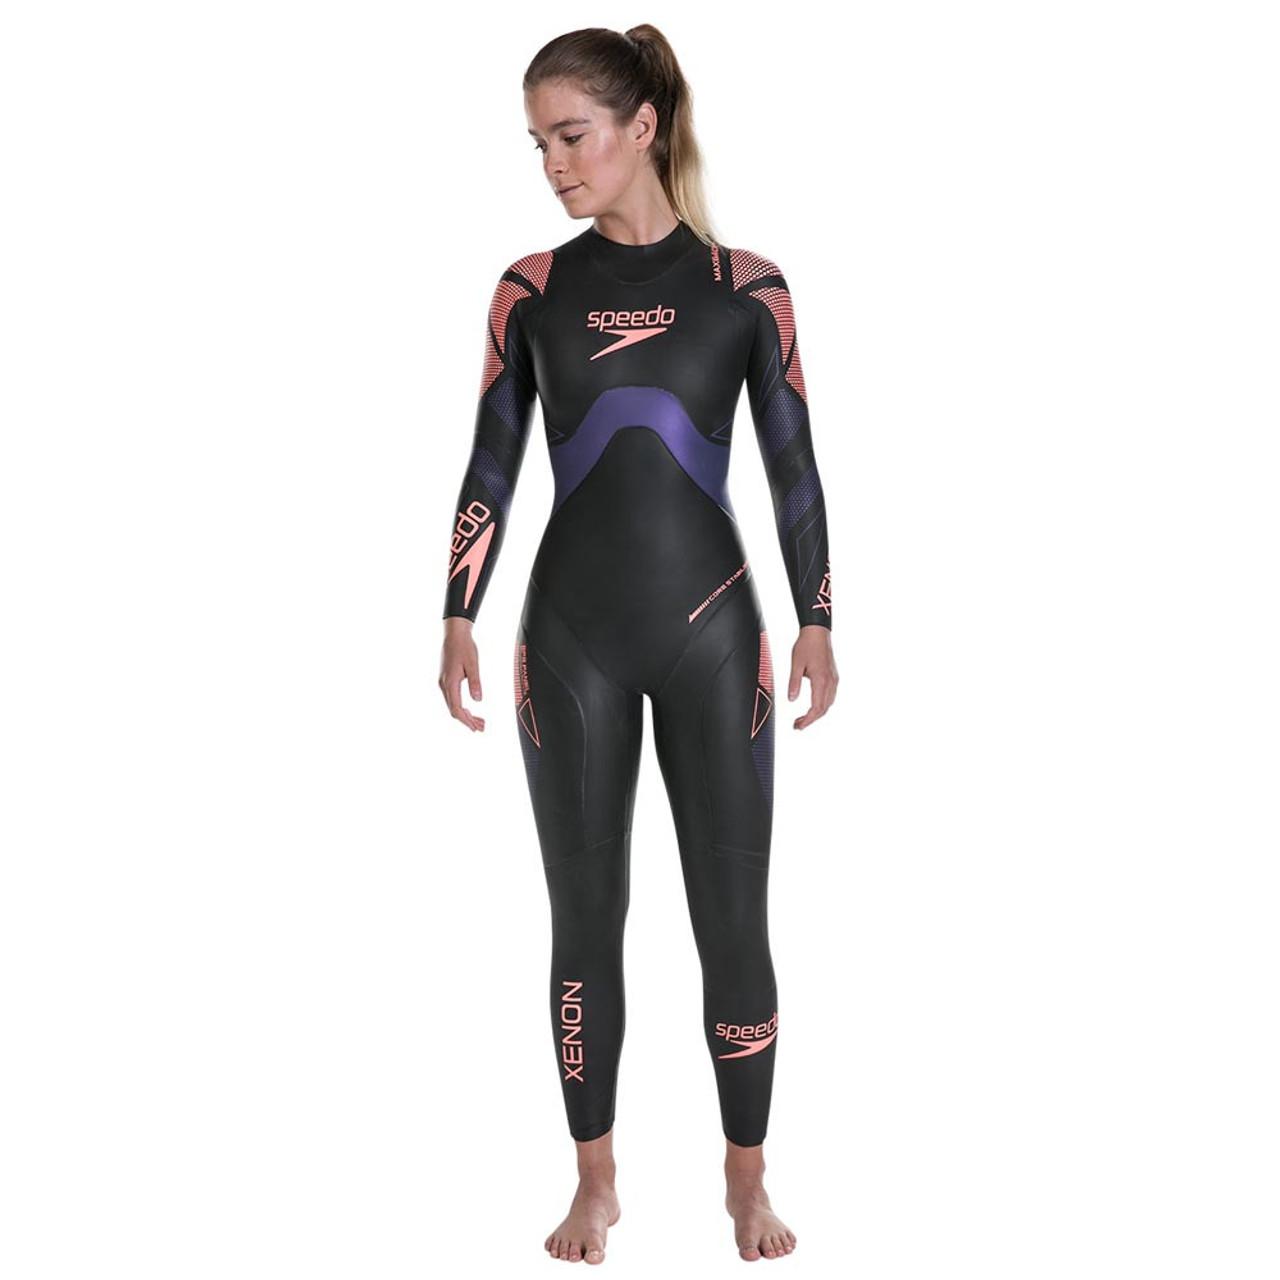 Speedo Women s Fastskin Xenon Full Sleeve Wetsuit a77c0b0d0